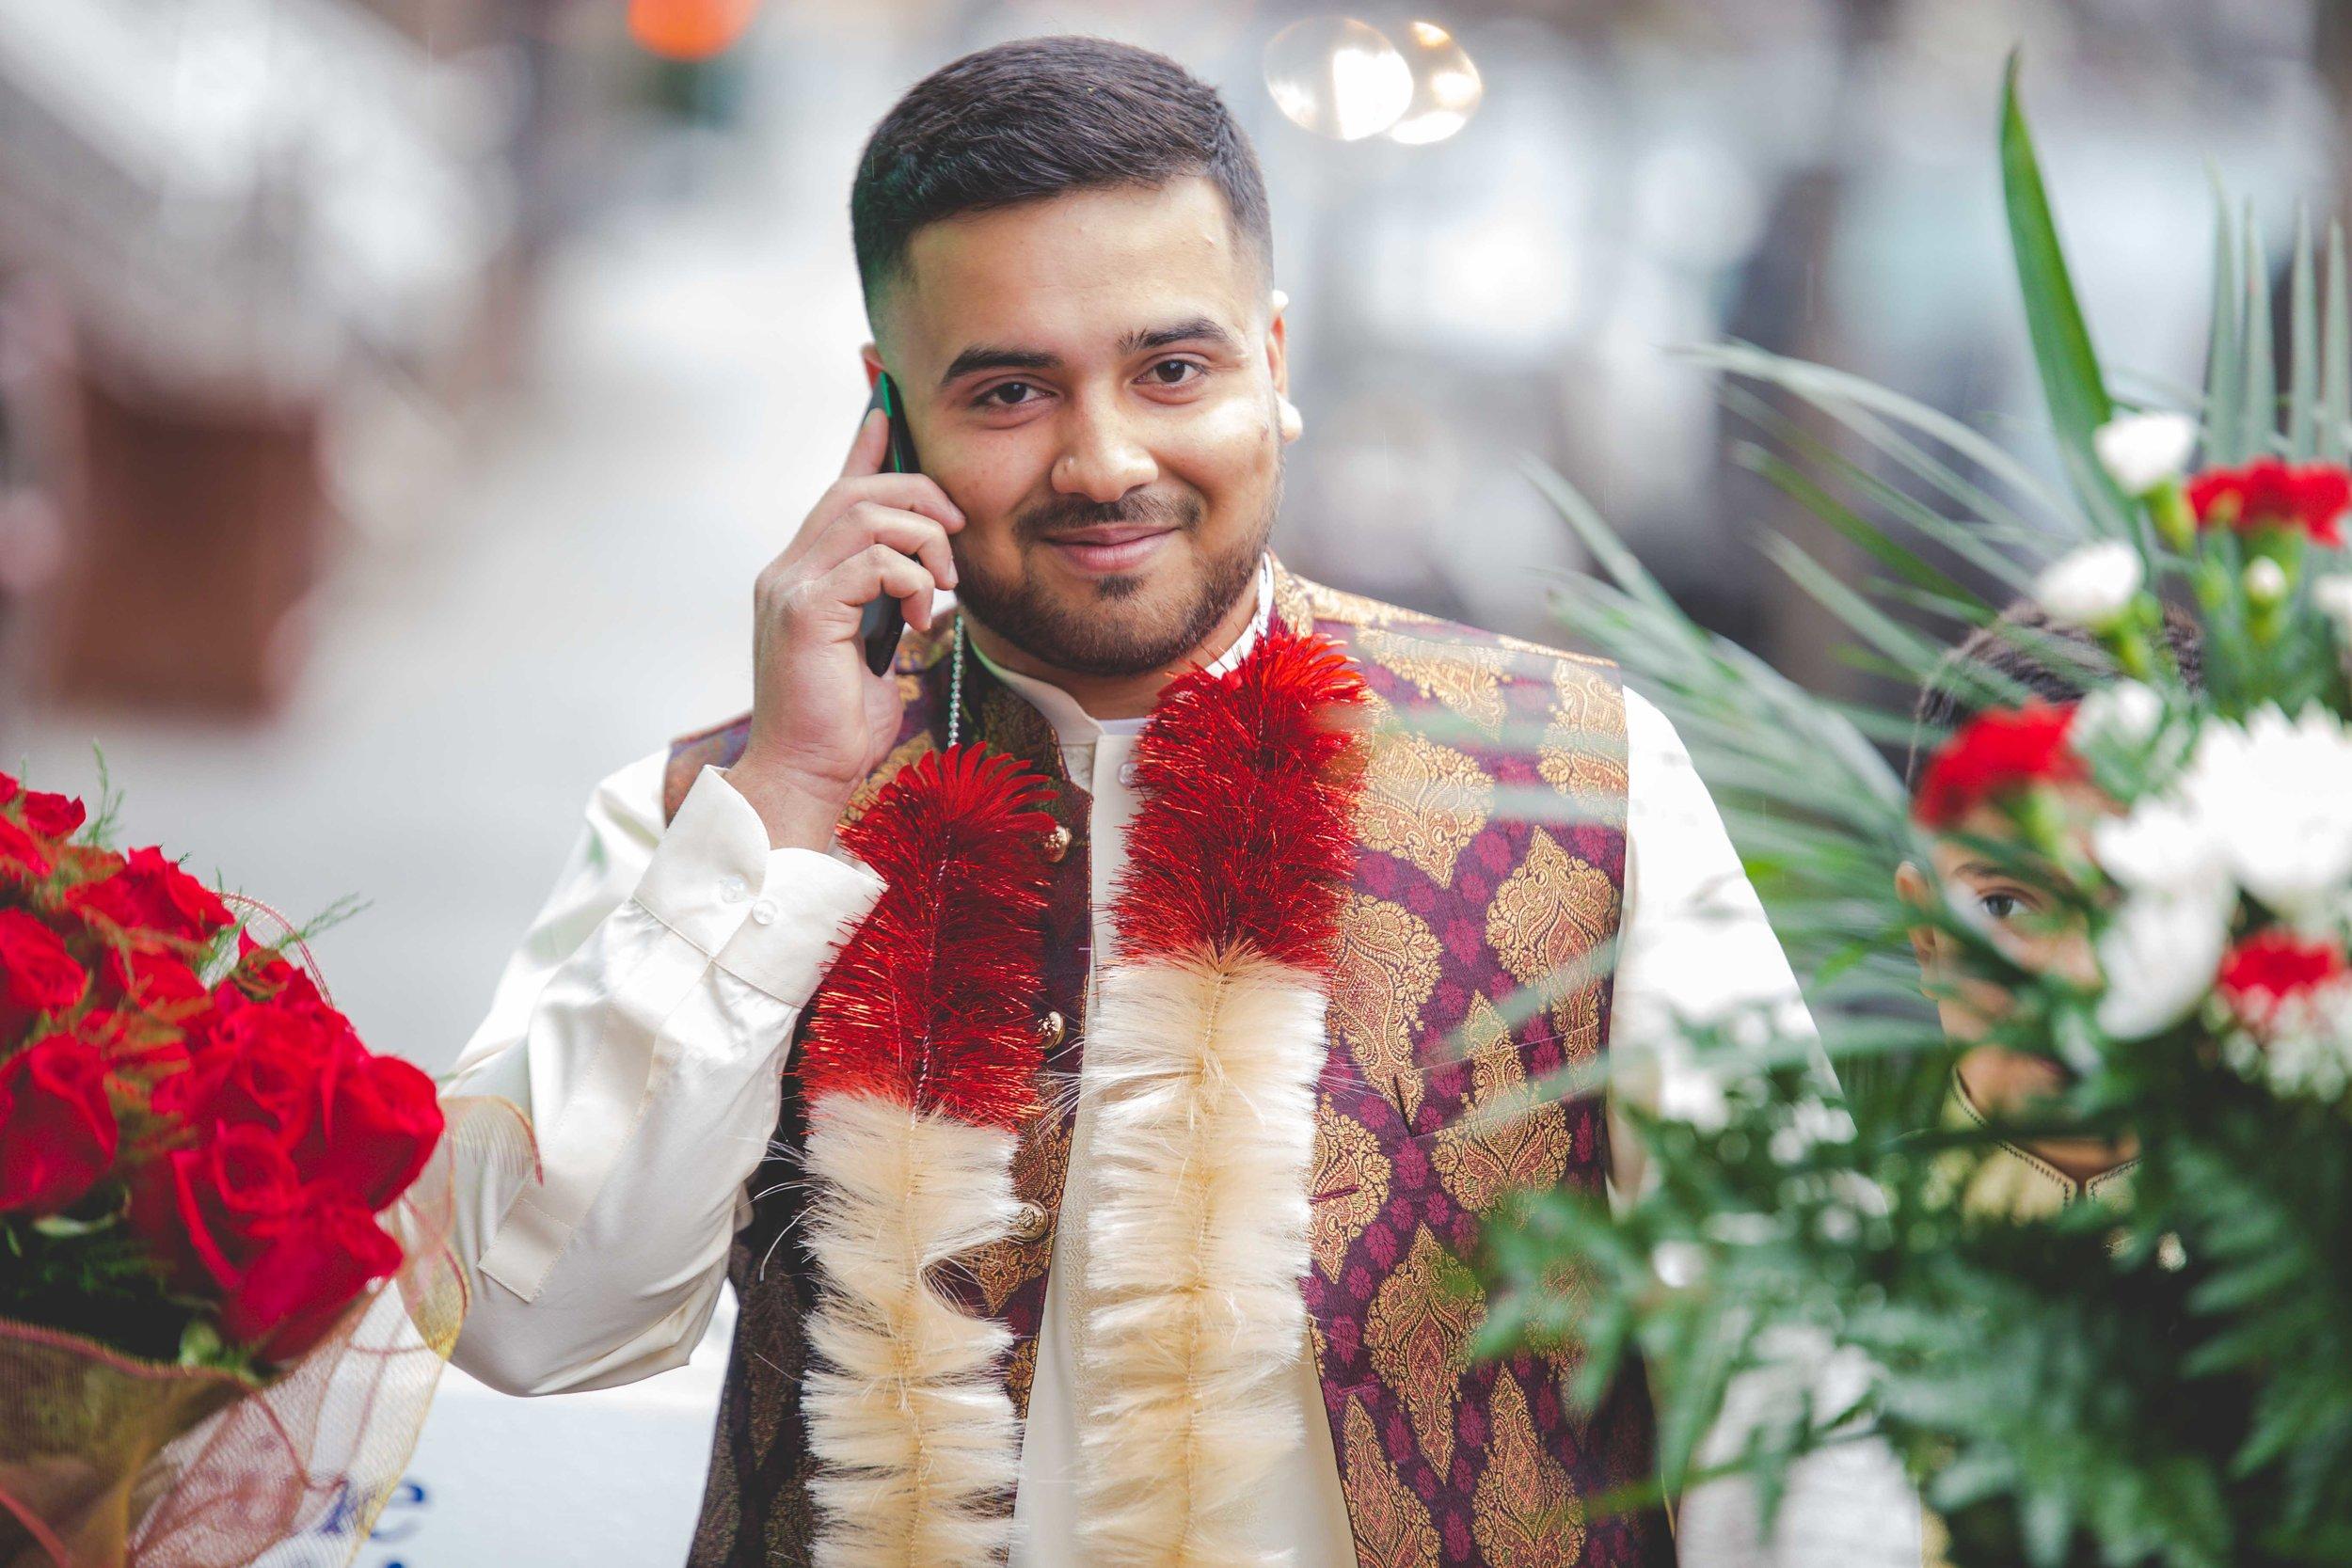 pakistani-wedding-photographer-brooklyn-new-york-8.jpg